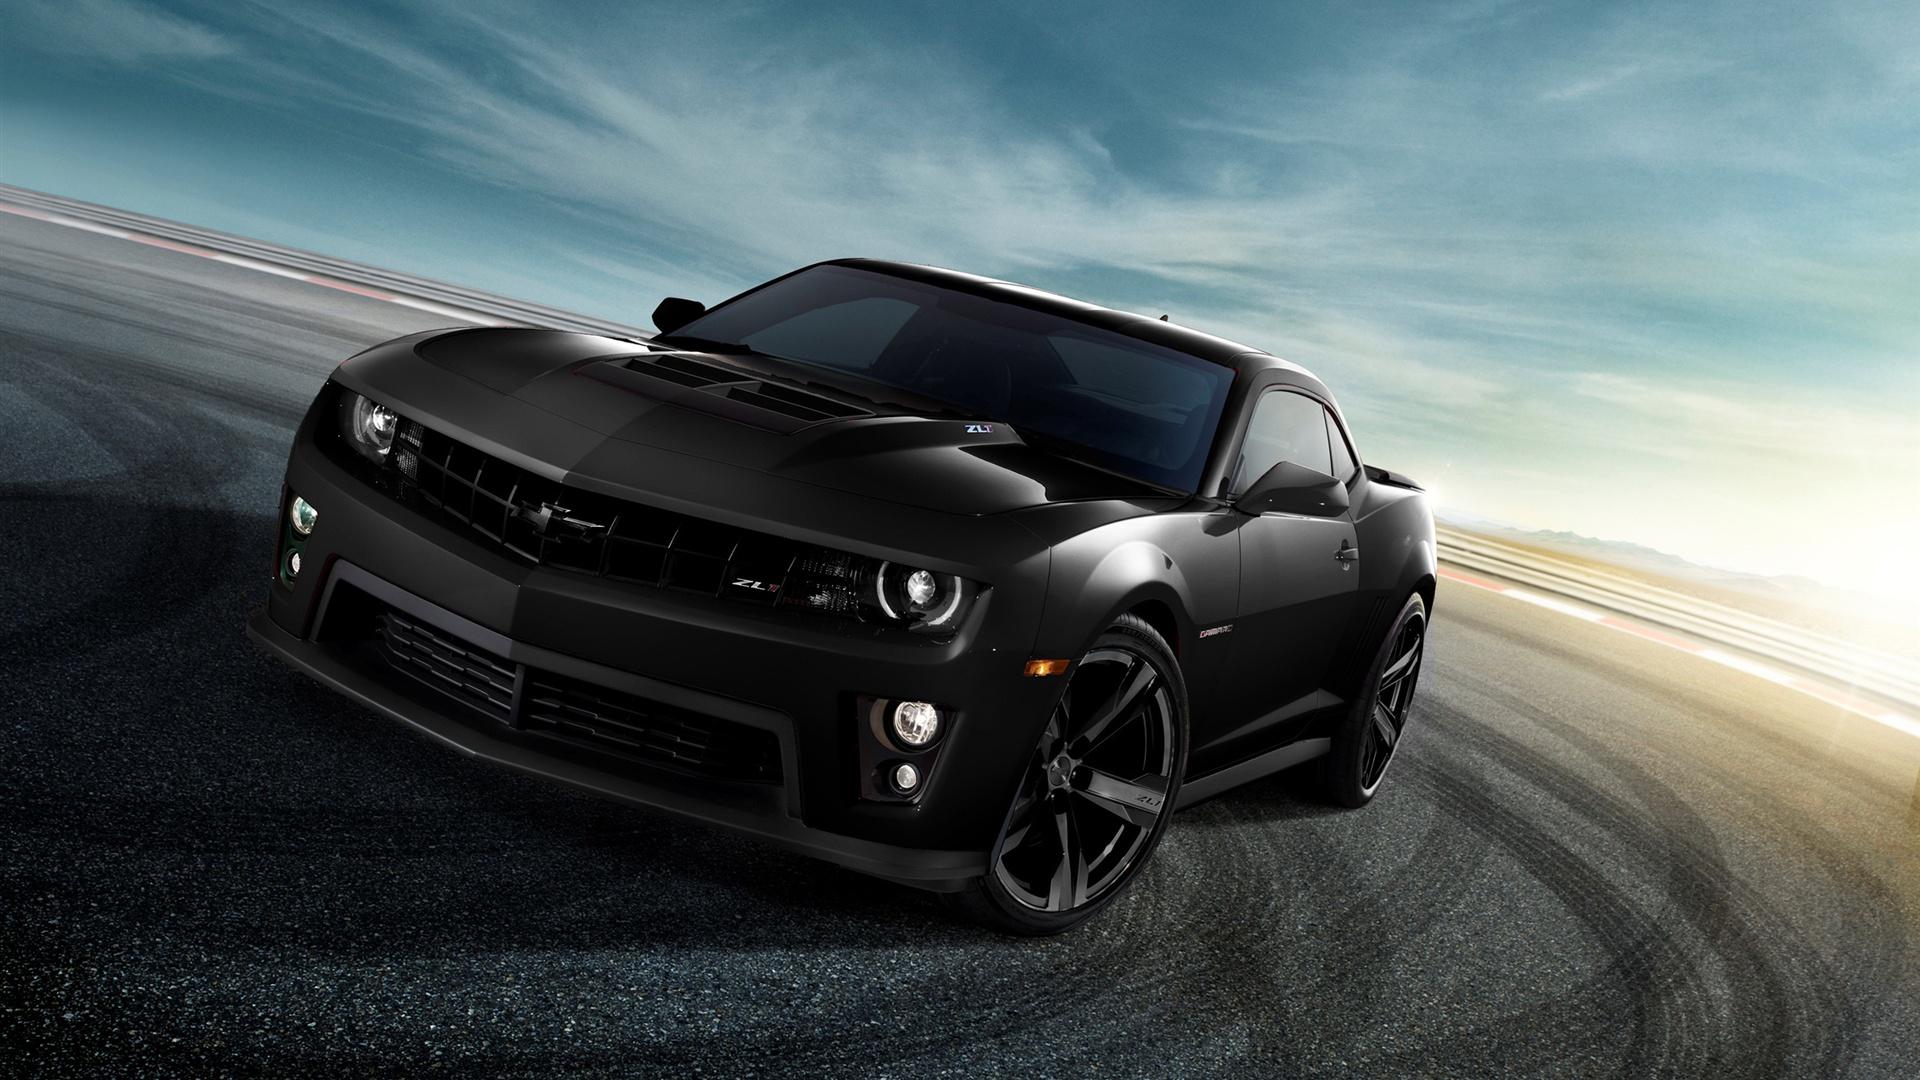 Chevrolet Camaro Zl Black Auto X likewise E E C A Ffd Aa Thumb additionally  as well Chevy Camaro Copo Zl Cpe Dv Hha as well Fandango P. on 69 chevy camaro ss